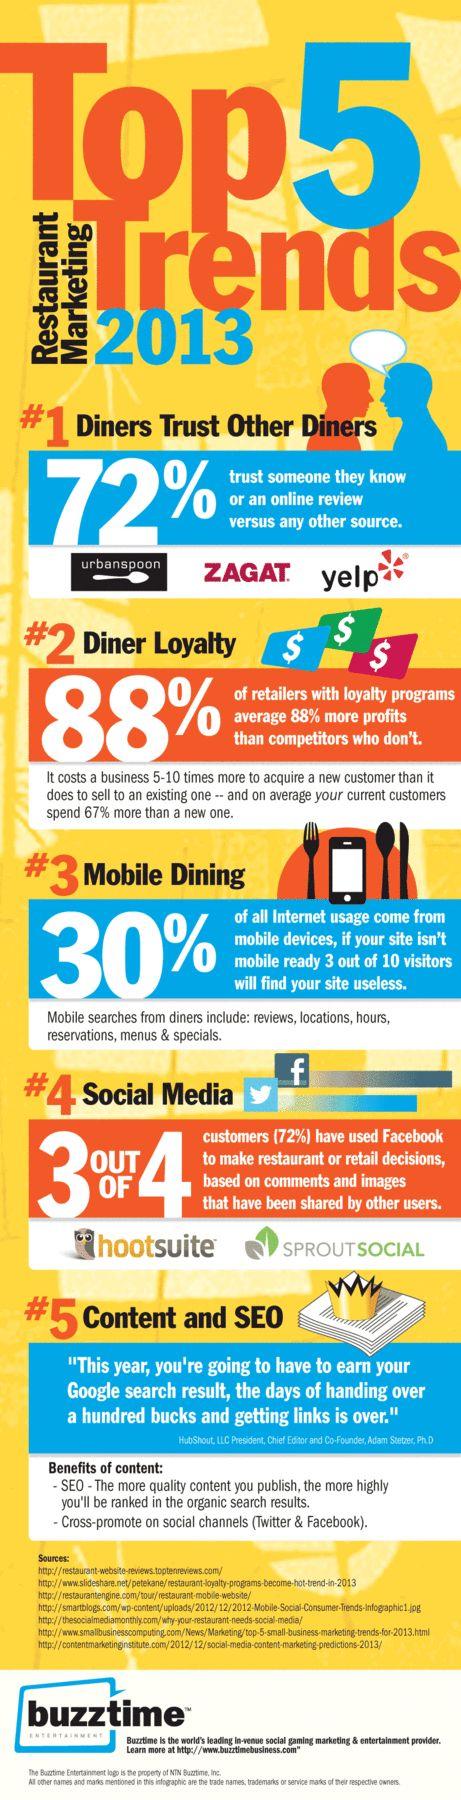 #Restaurant Marketing Trends 2013 #Infographic